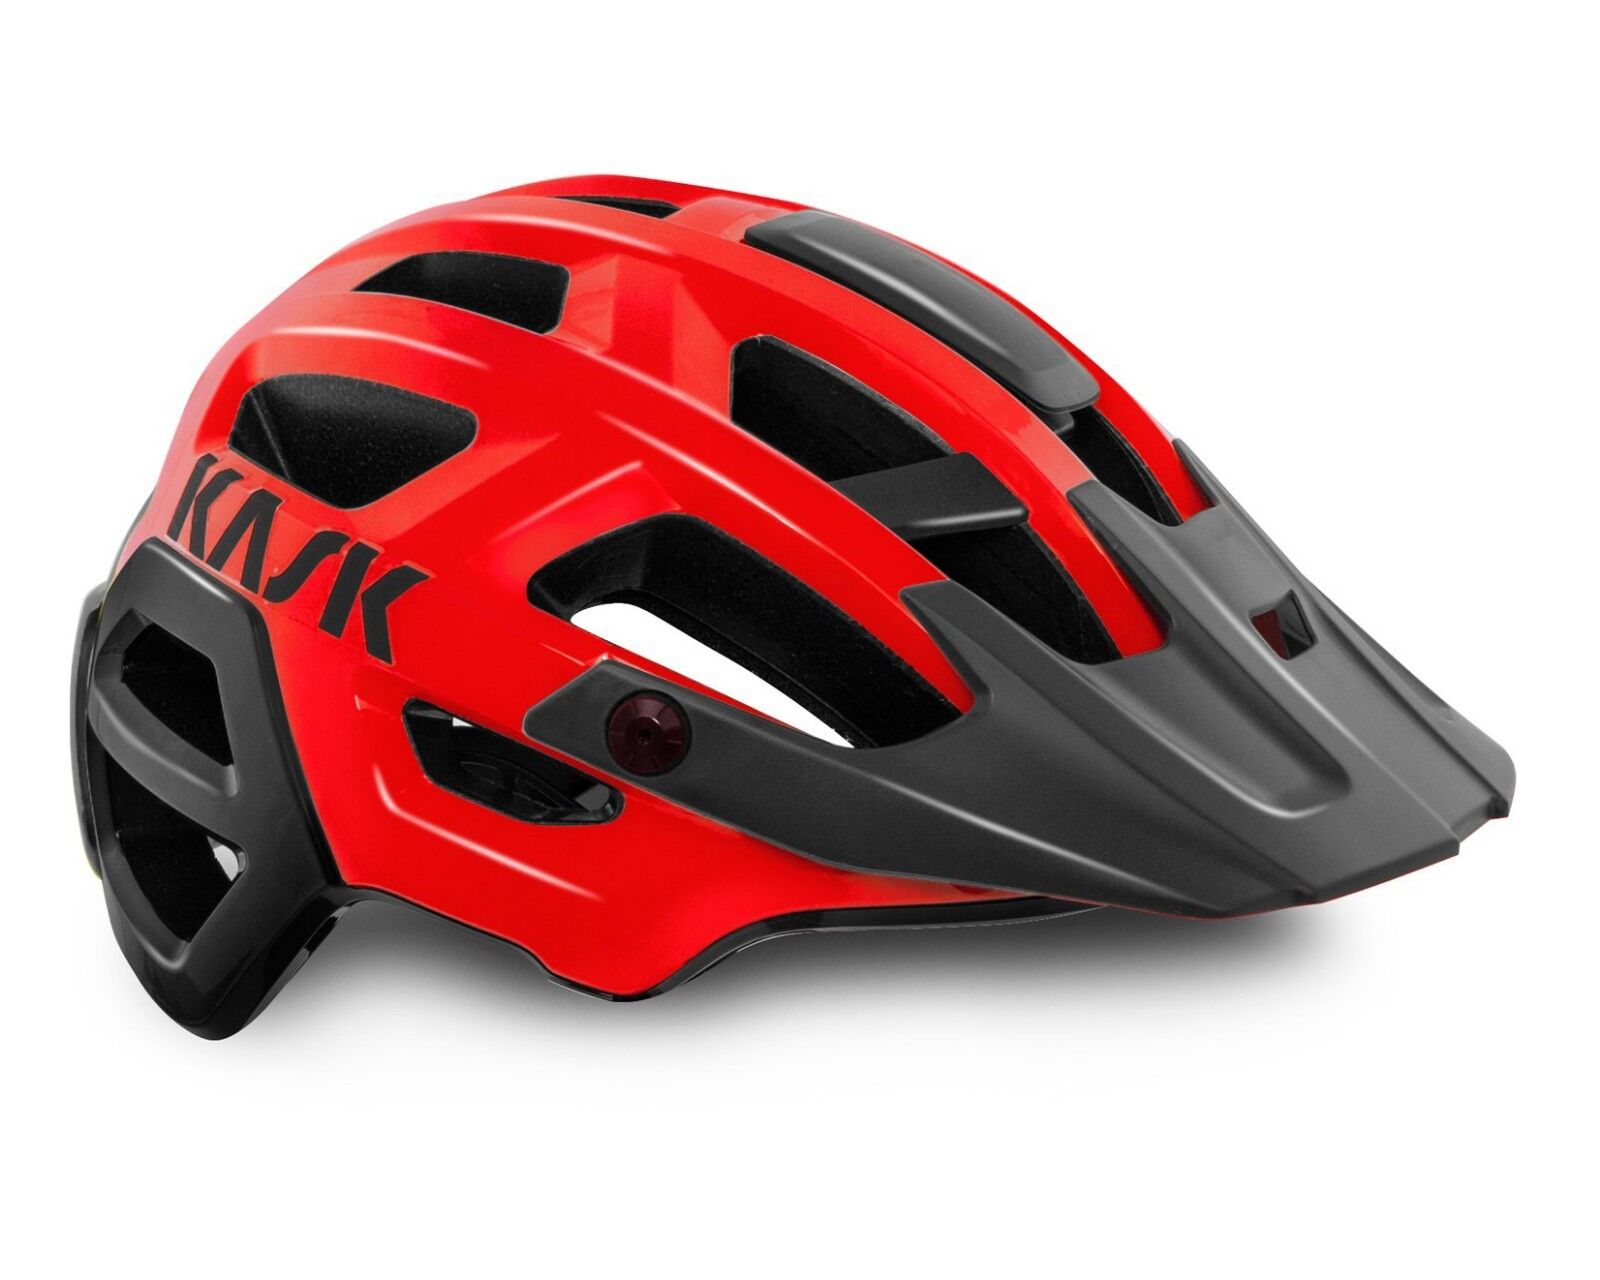 KASK REX MTB Cycling Helmet - Red [M 52-58. L 59-62cm]